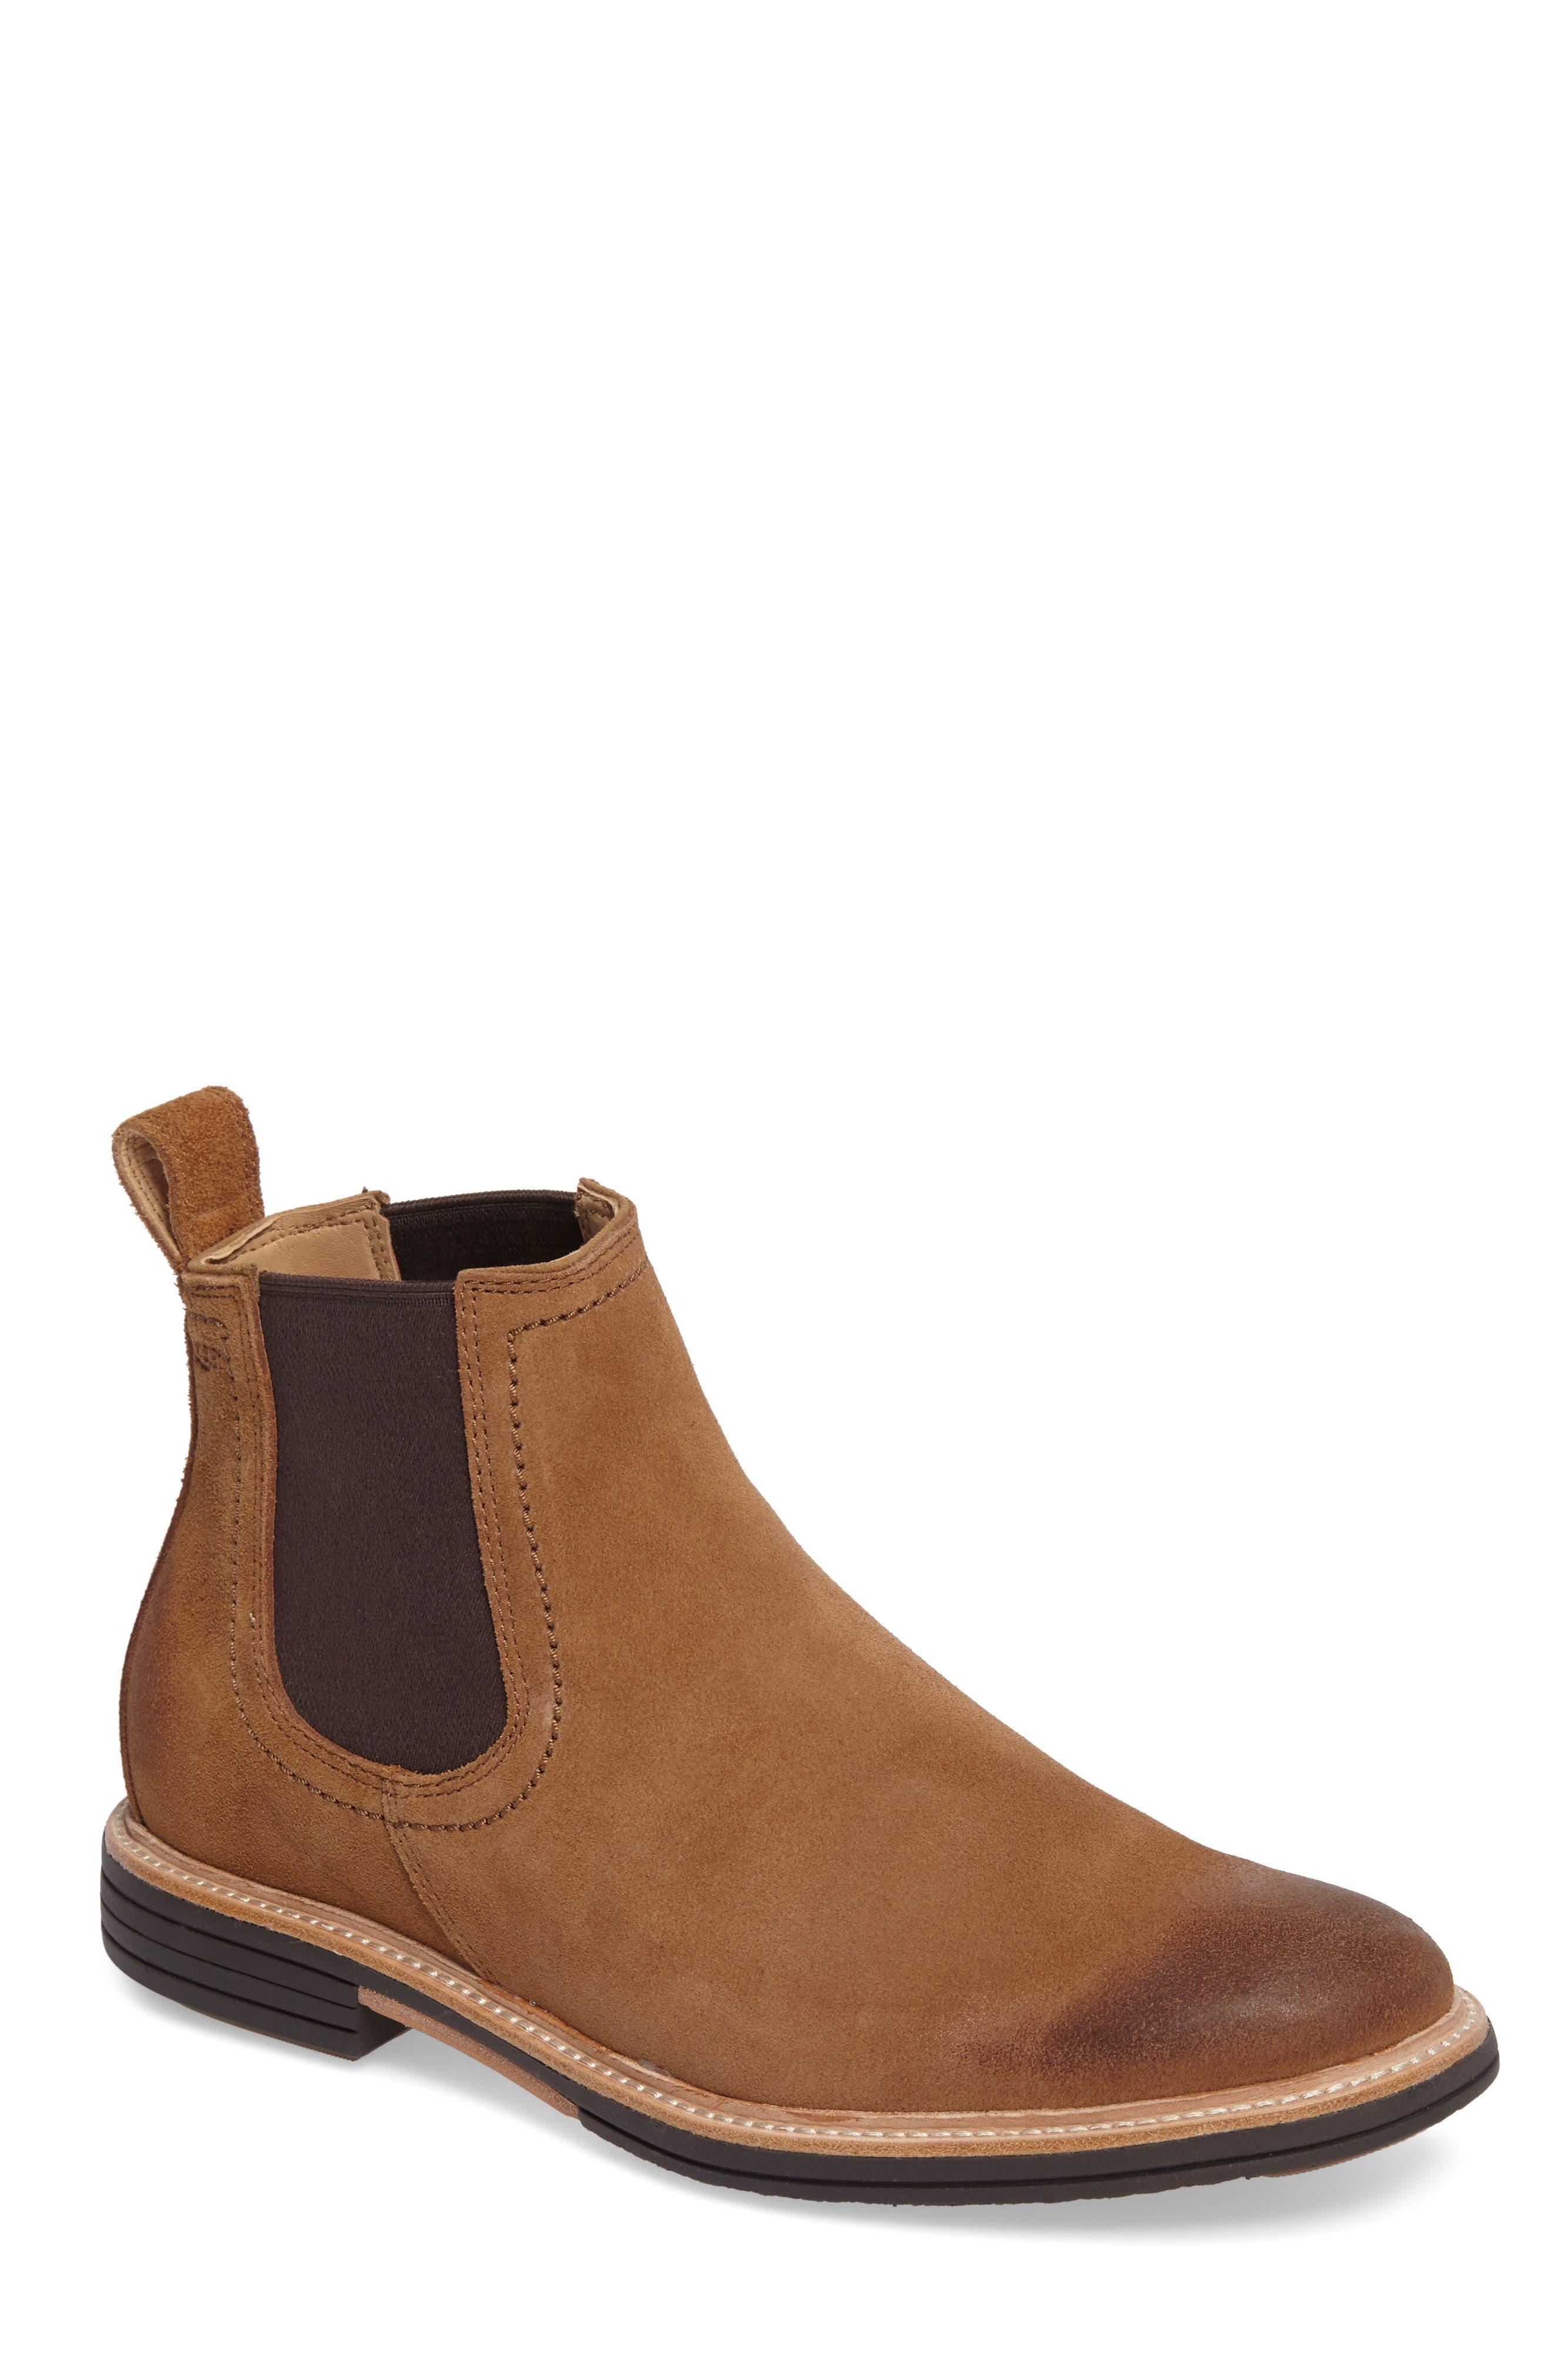 Alternate Image 1 Selected - UGG® Baldvin Chelsea Boot (Men)